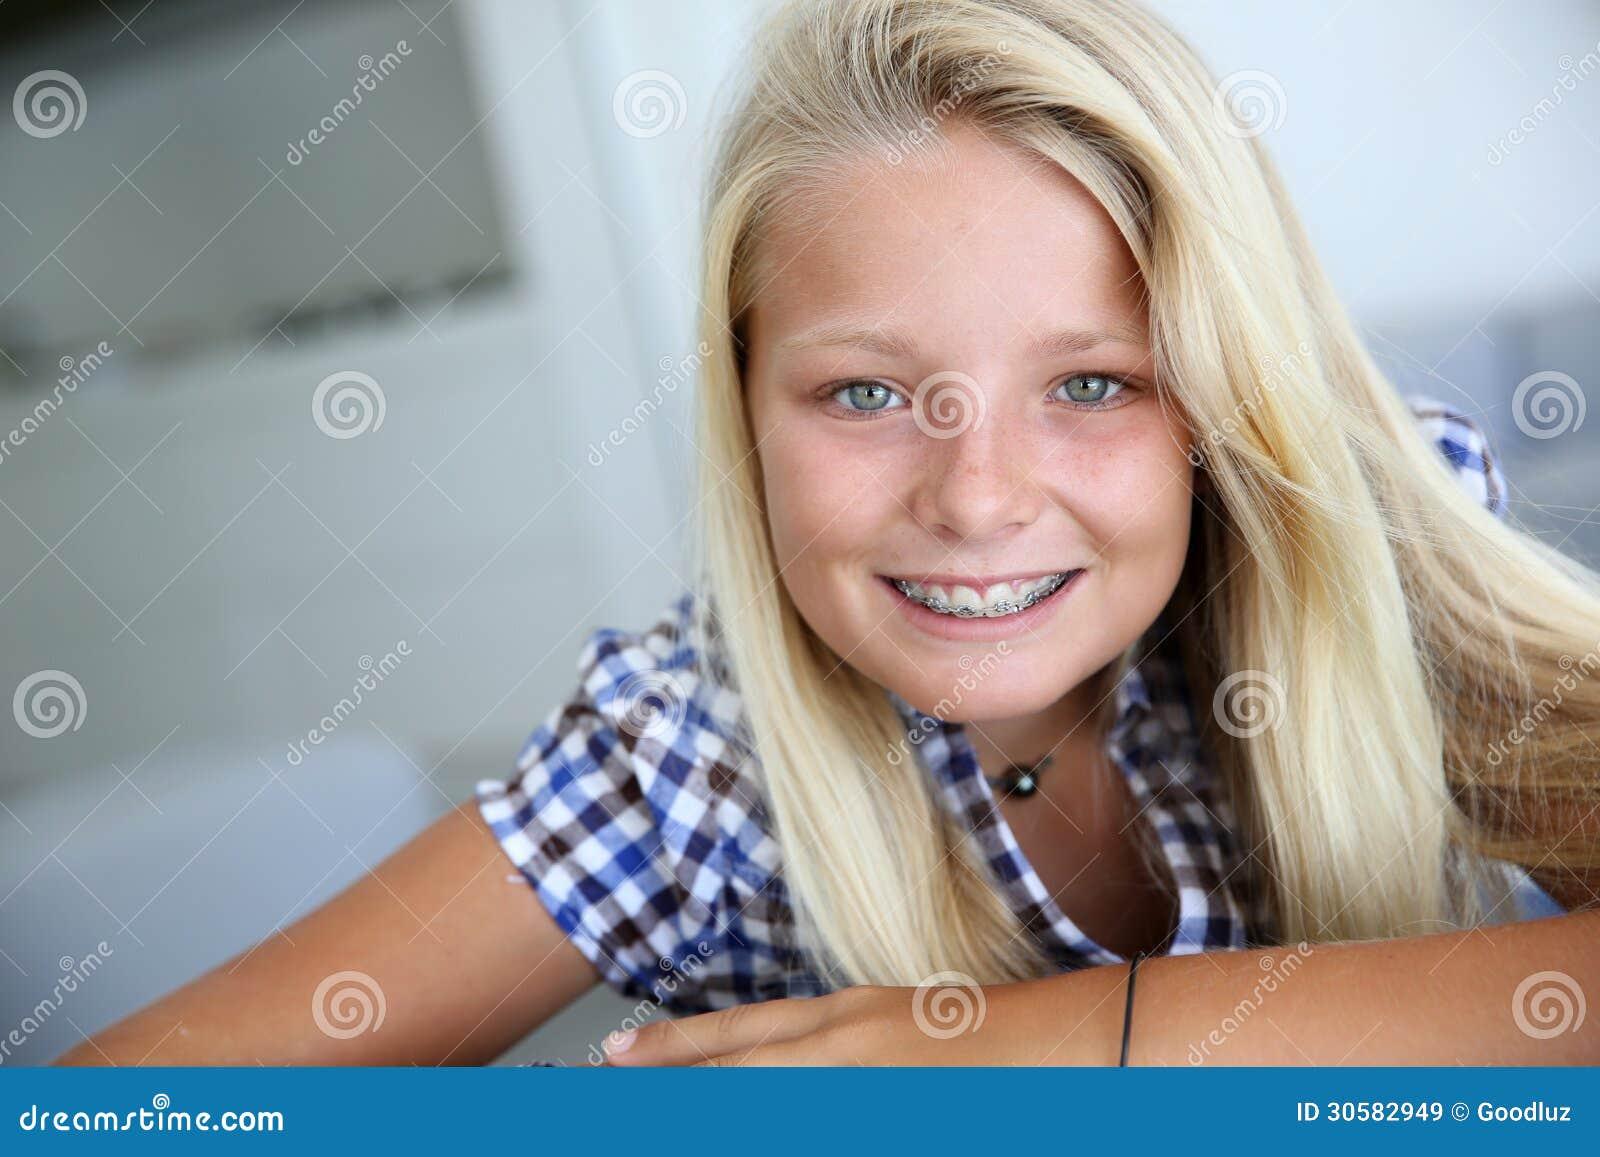 Braces lines tan girl teen